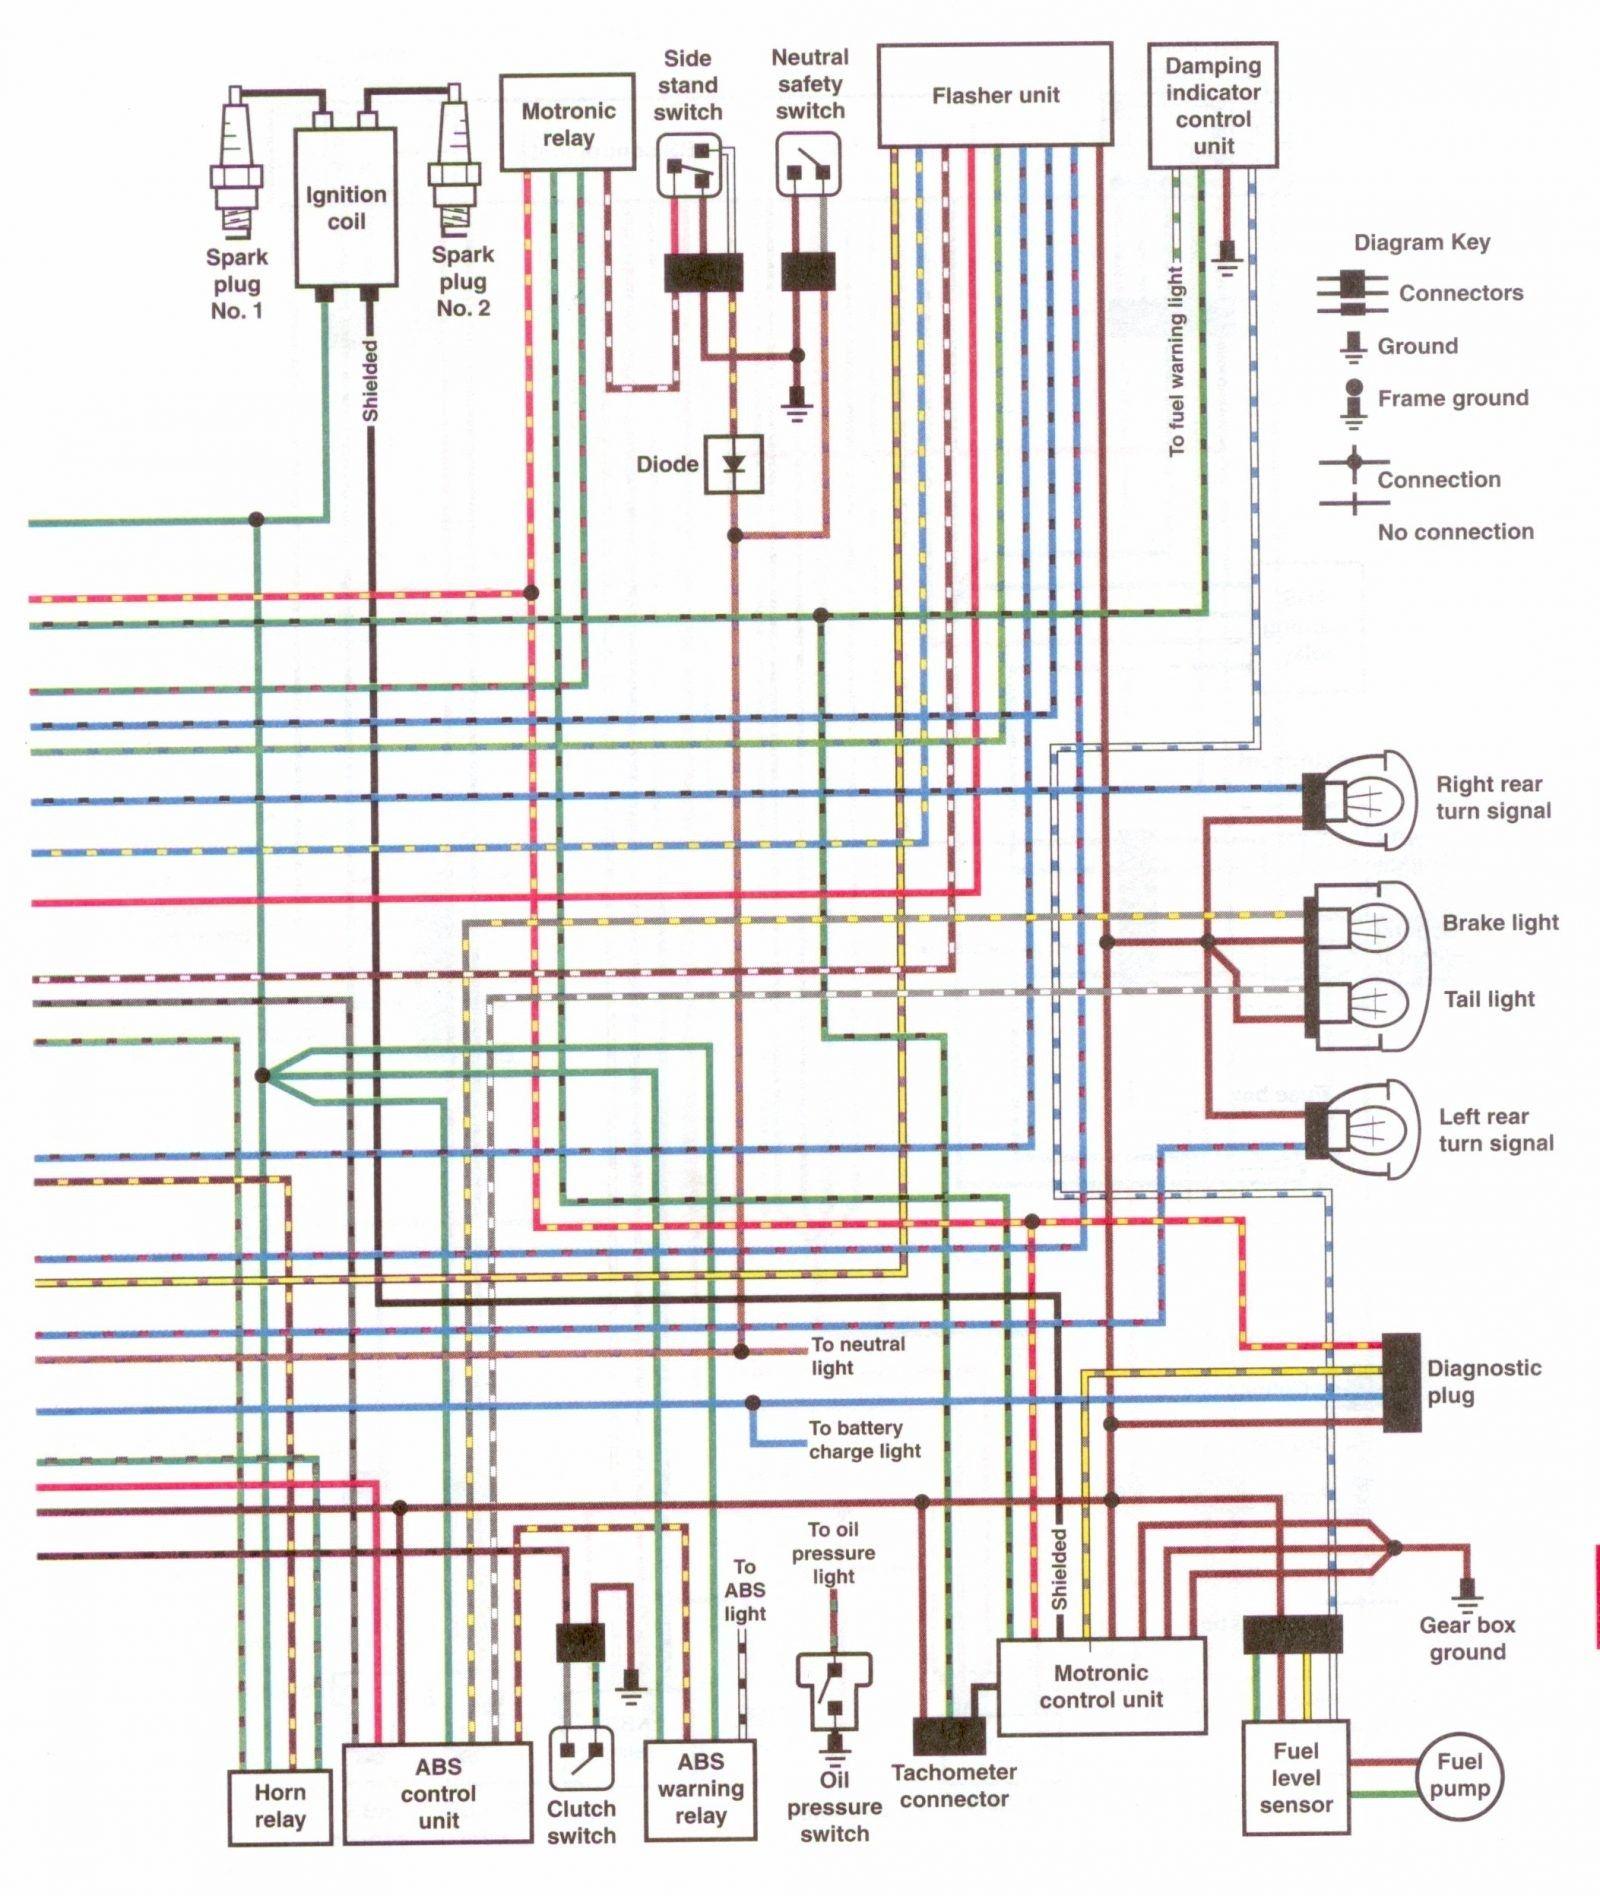 Lenel 2220 Wiring Diagram In 2021 Bmw E46 Diagram Bmw